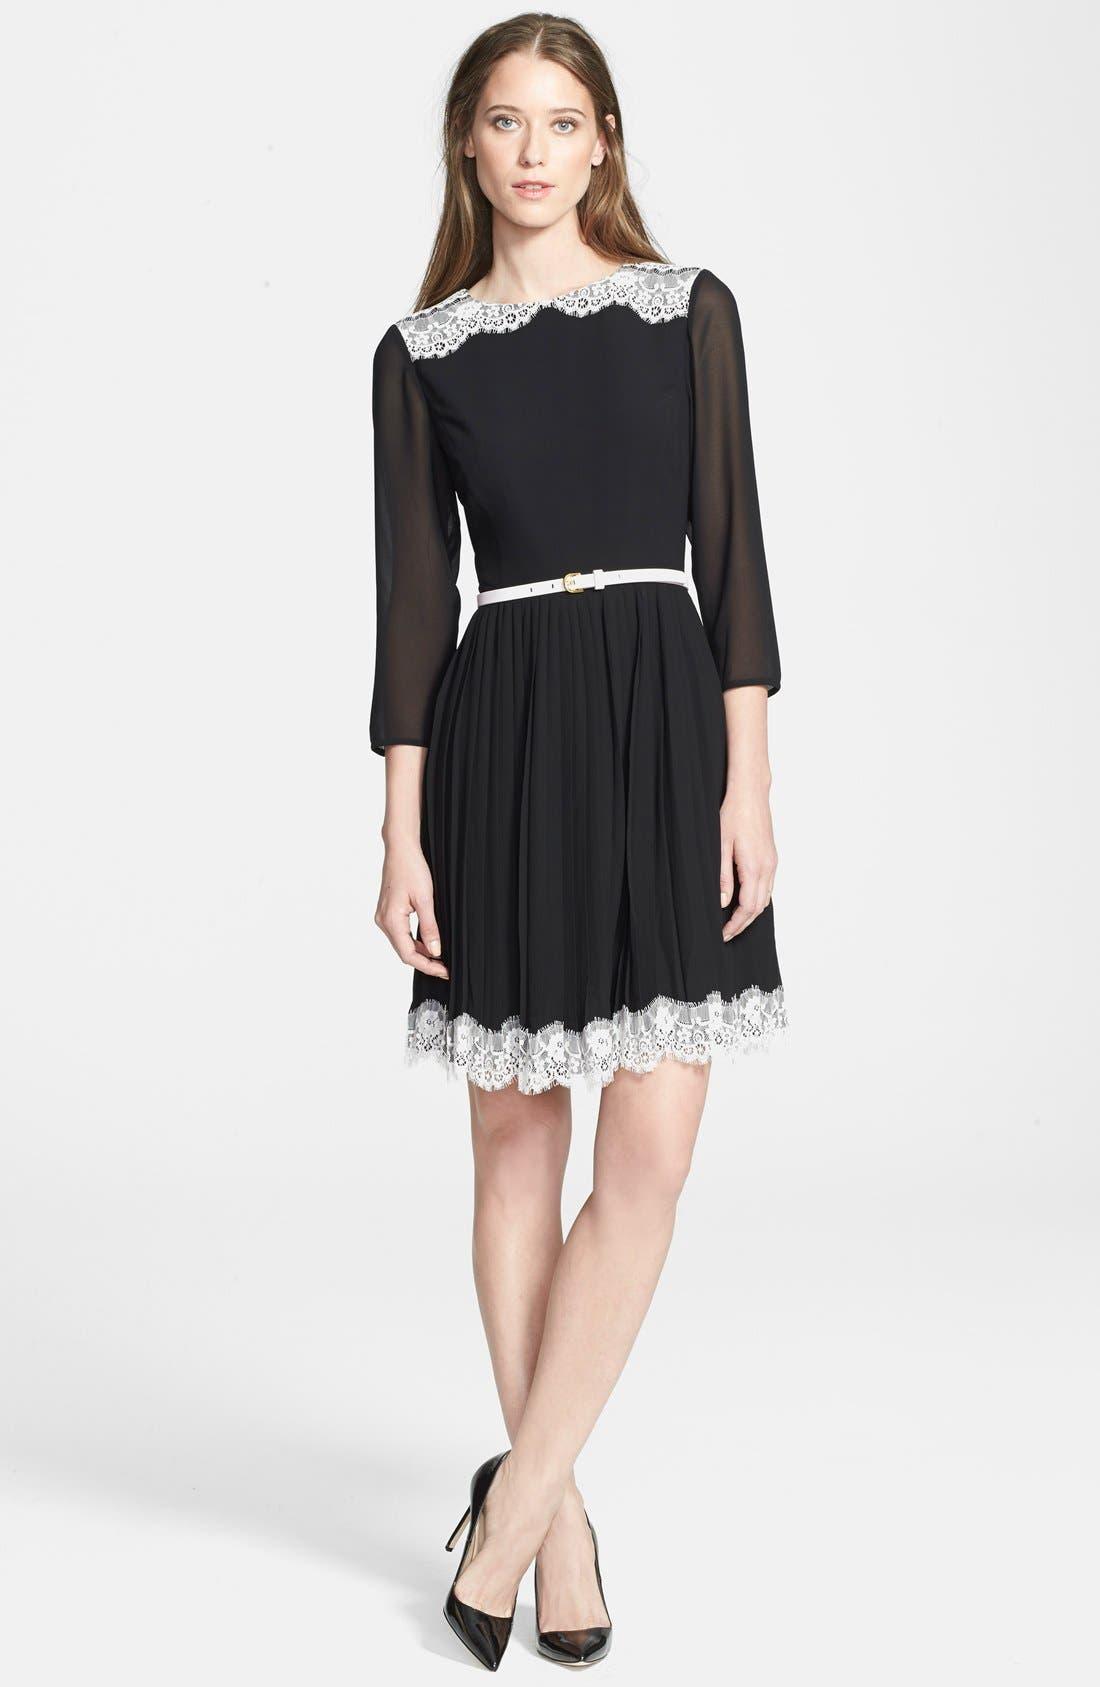 Alternate Image 1 Selected - Ted Baker London 'Olivhia' Lace Detail A-Line Dress